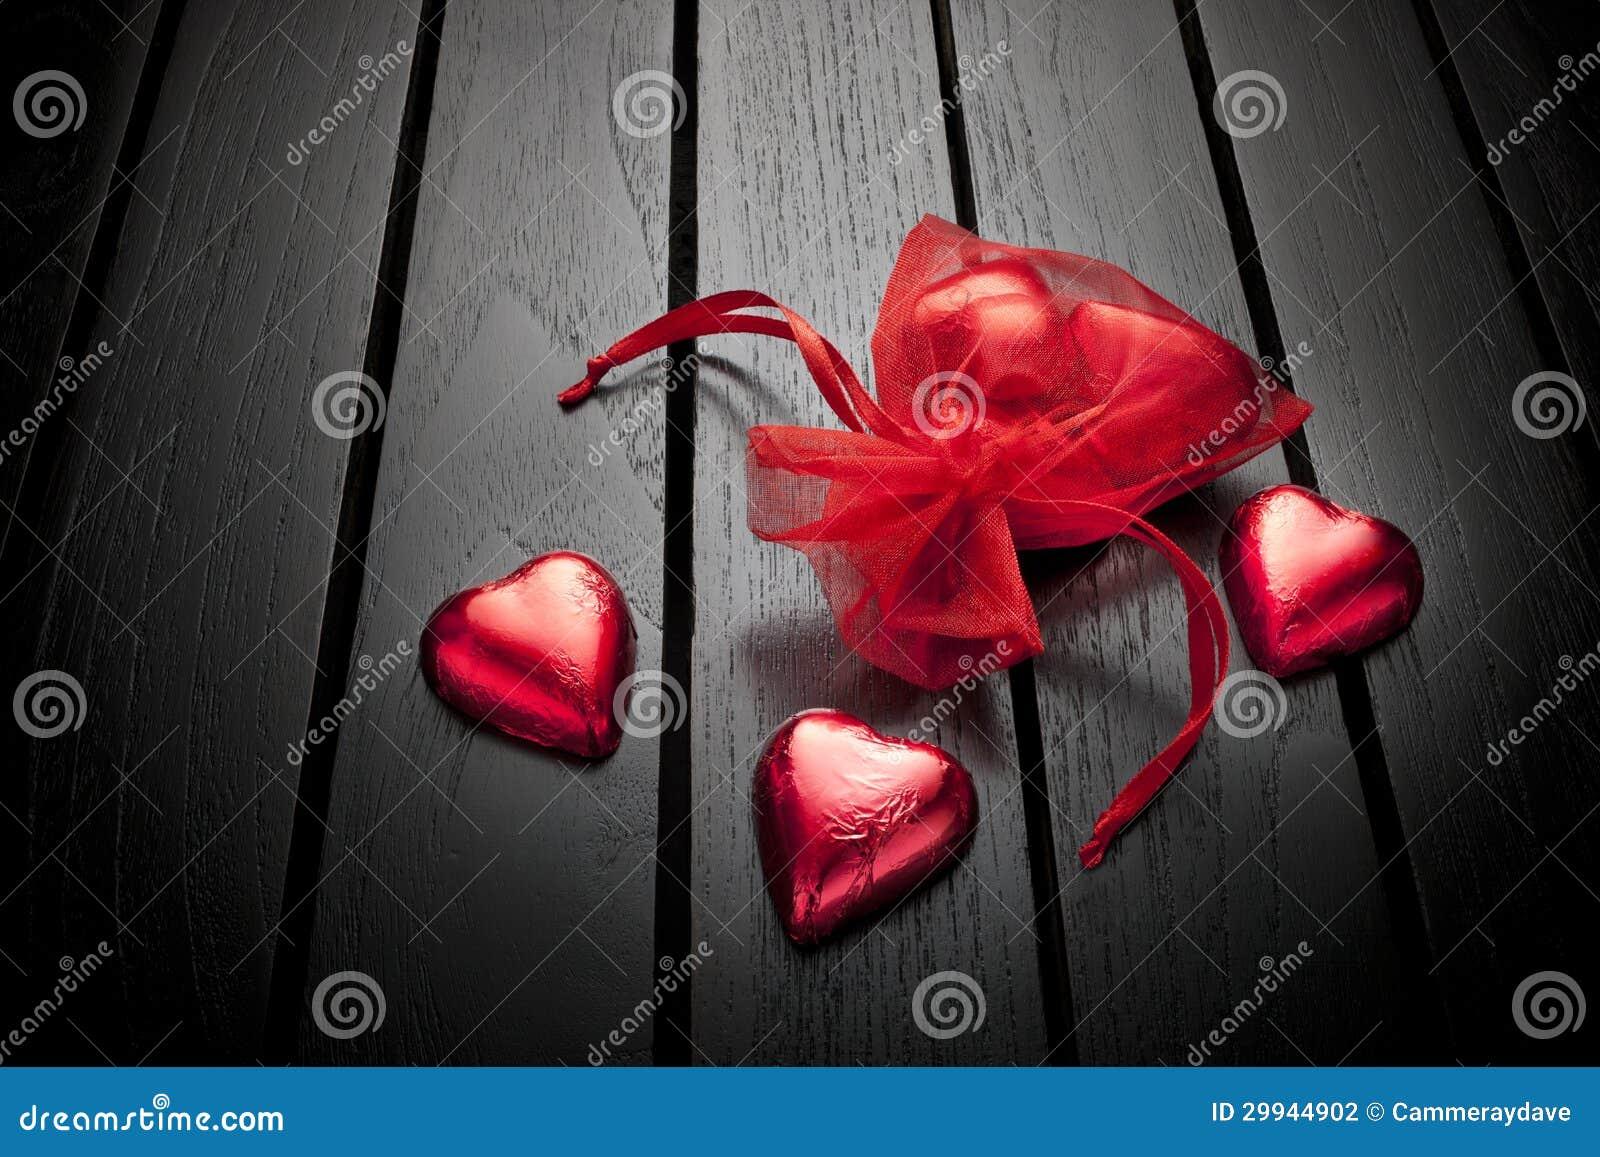 Valentine Love Chocolate Heart Background Stock ...